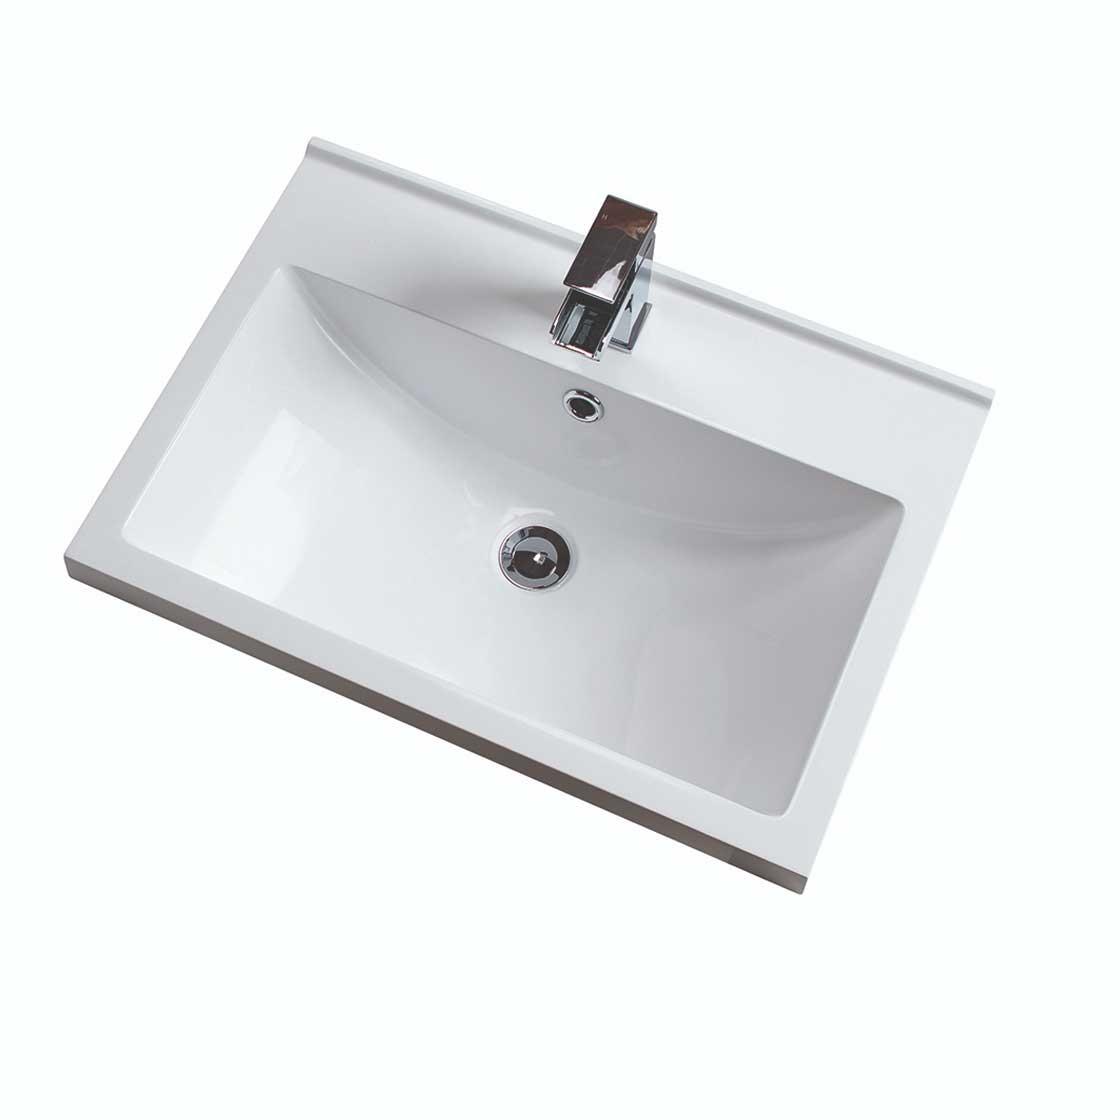 Cali Idon 2-Door Free Standing Vanity Unit with Basin - 600mm Wide - Gloss White